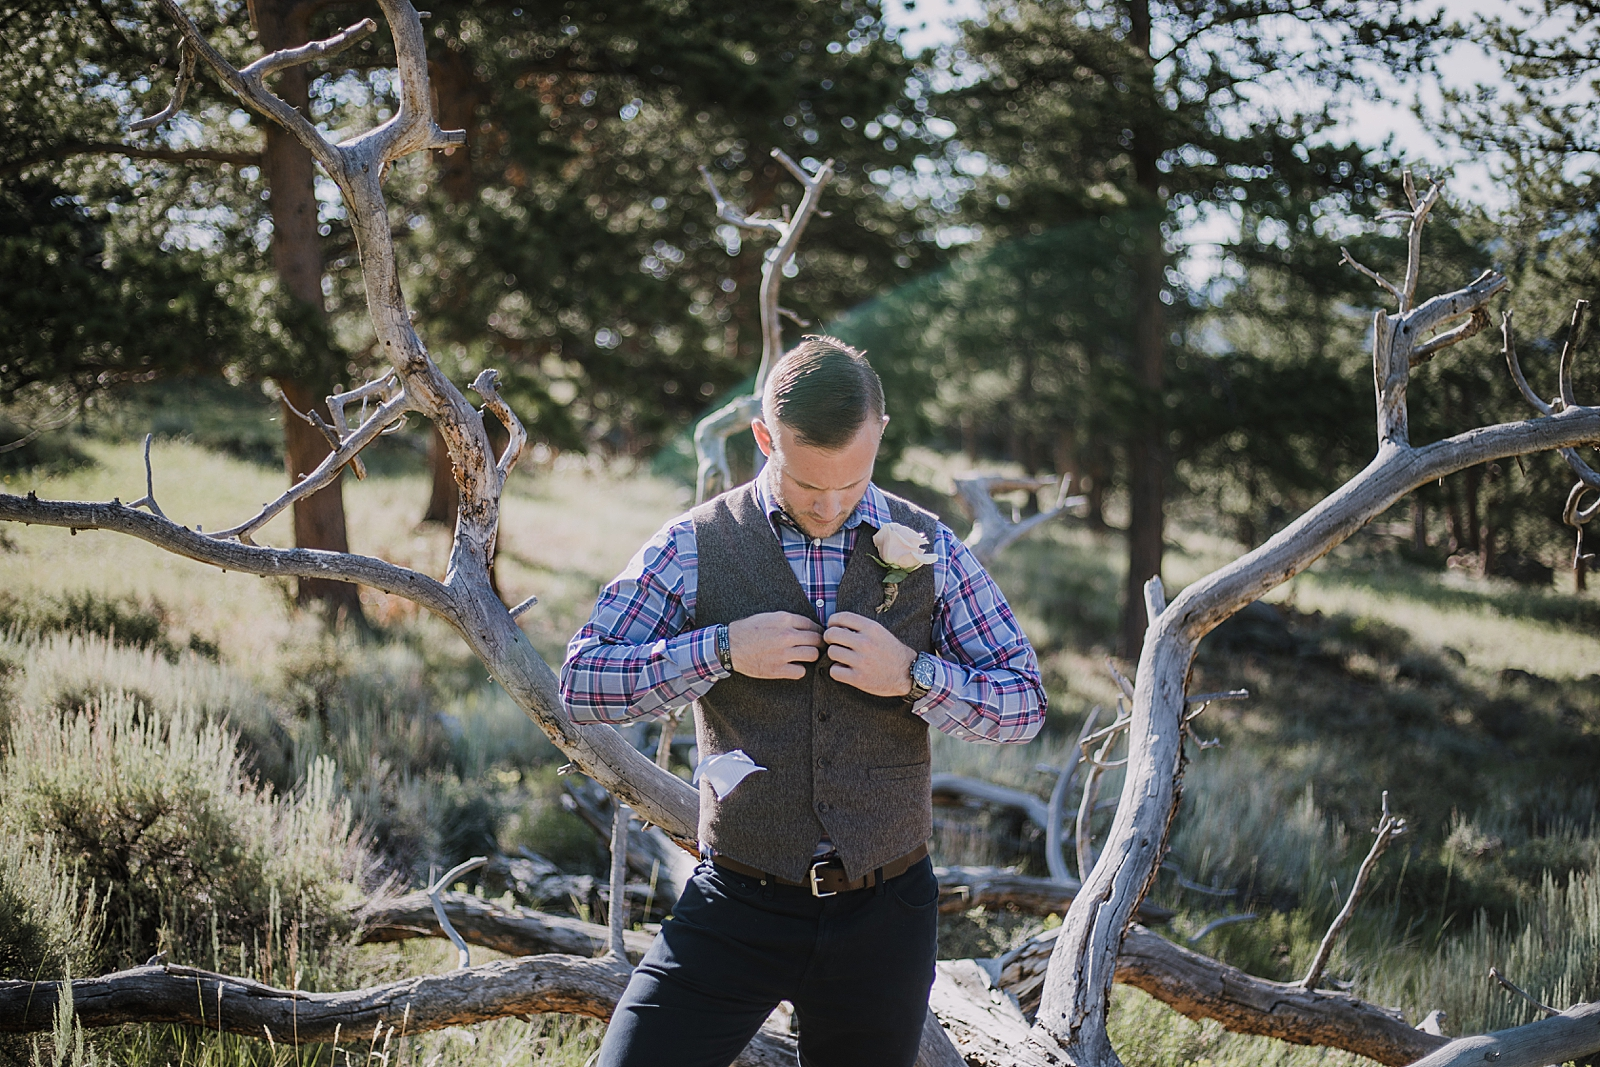 national park ranger groom, rocky mountain national park elopement, 3M curves elopement, self solemnizing, self solemnization, long's peak ceremony, hiking elopement, estes park elopement